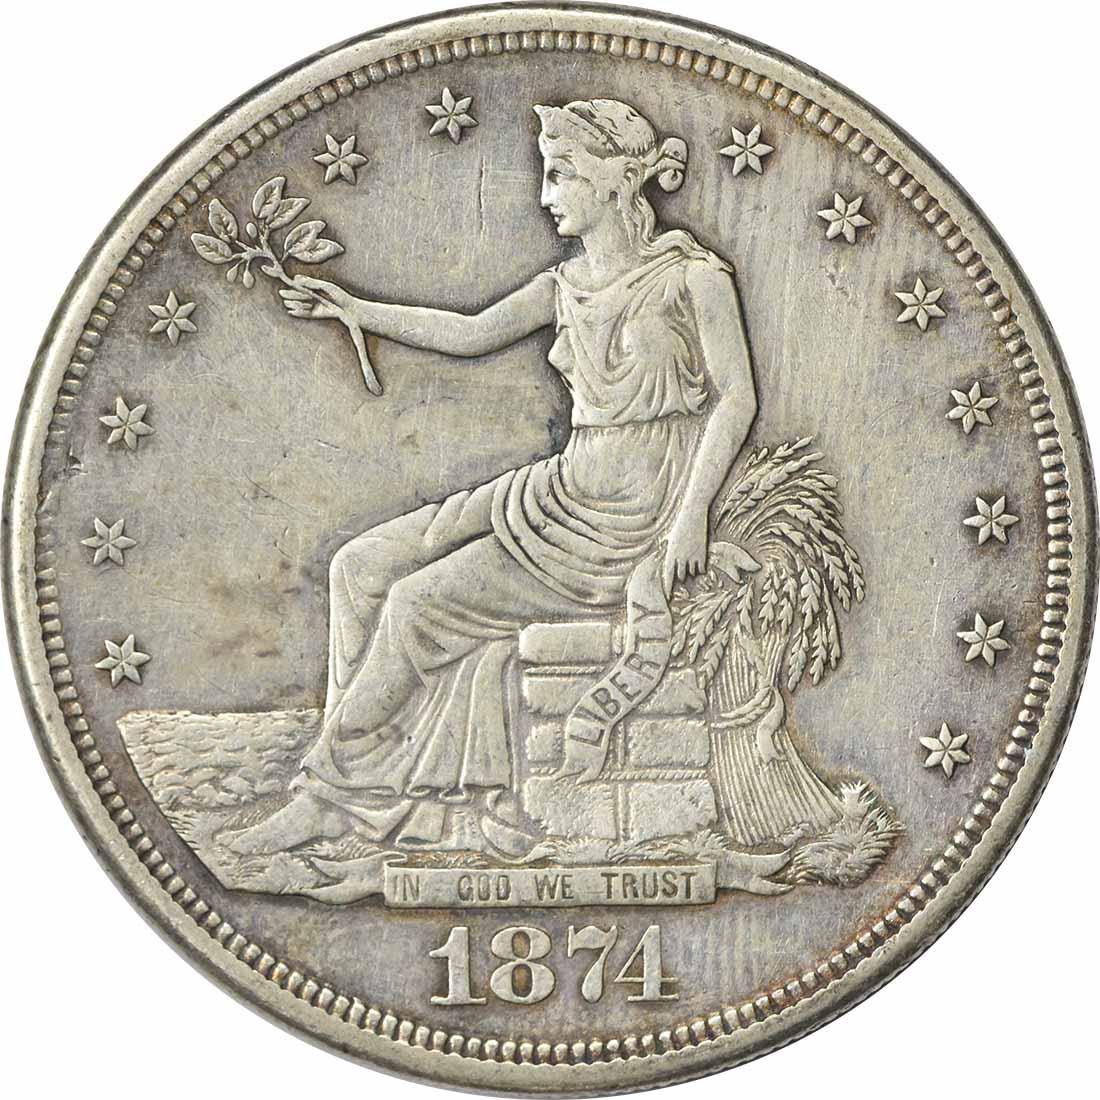 1874-S Trade Silver Dollar EF Uncertified